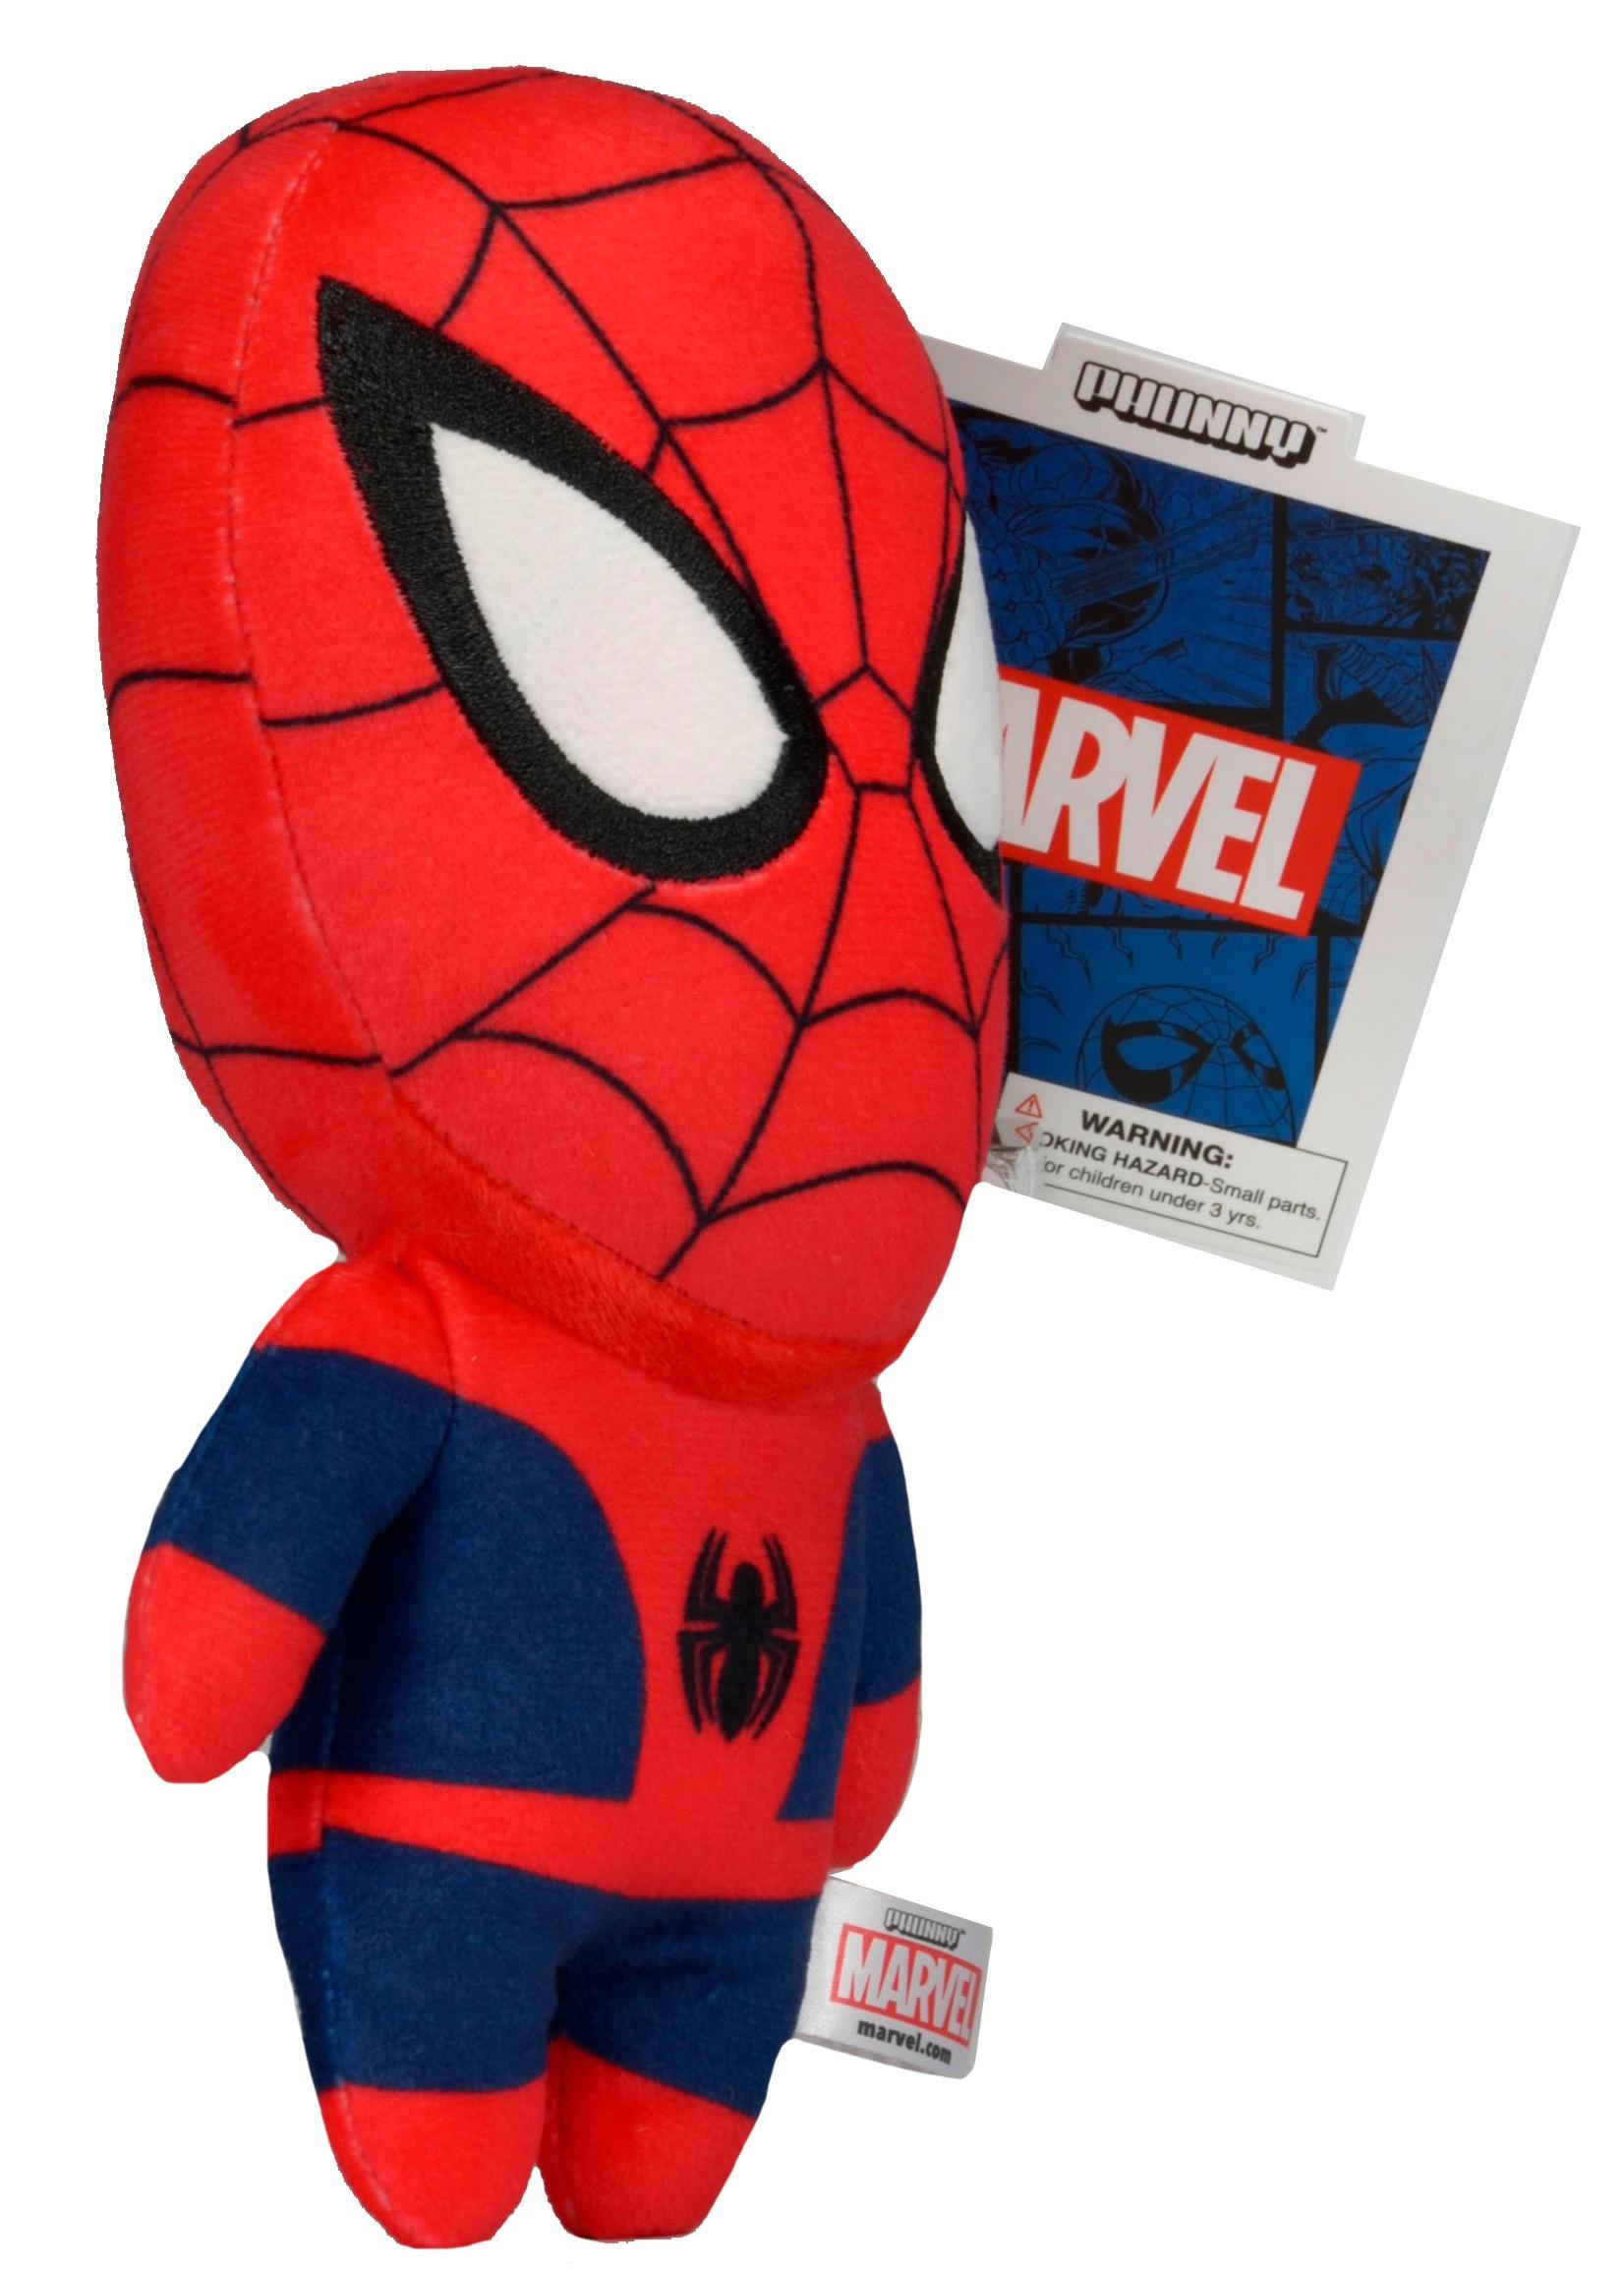 Фото Мягкая игрушка Marvel Phunnys. Spider-Man (20 см) marvel phunny s мягкая игрушка iron man